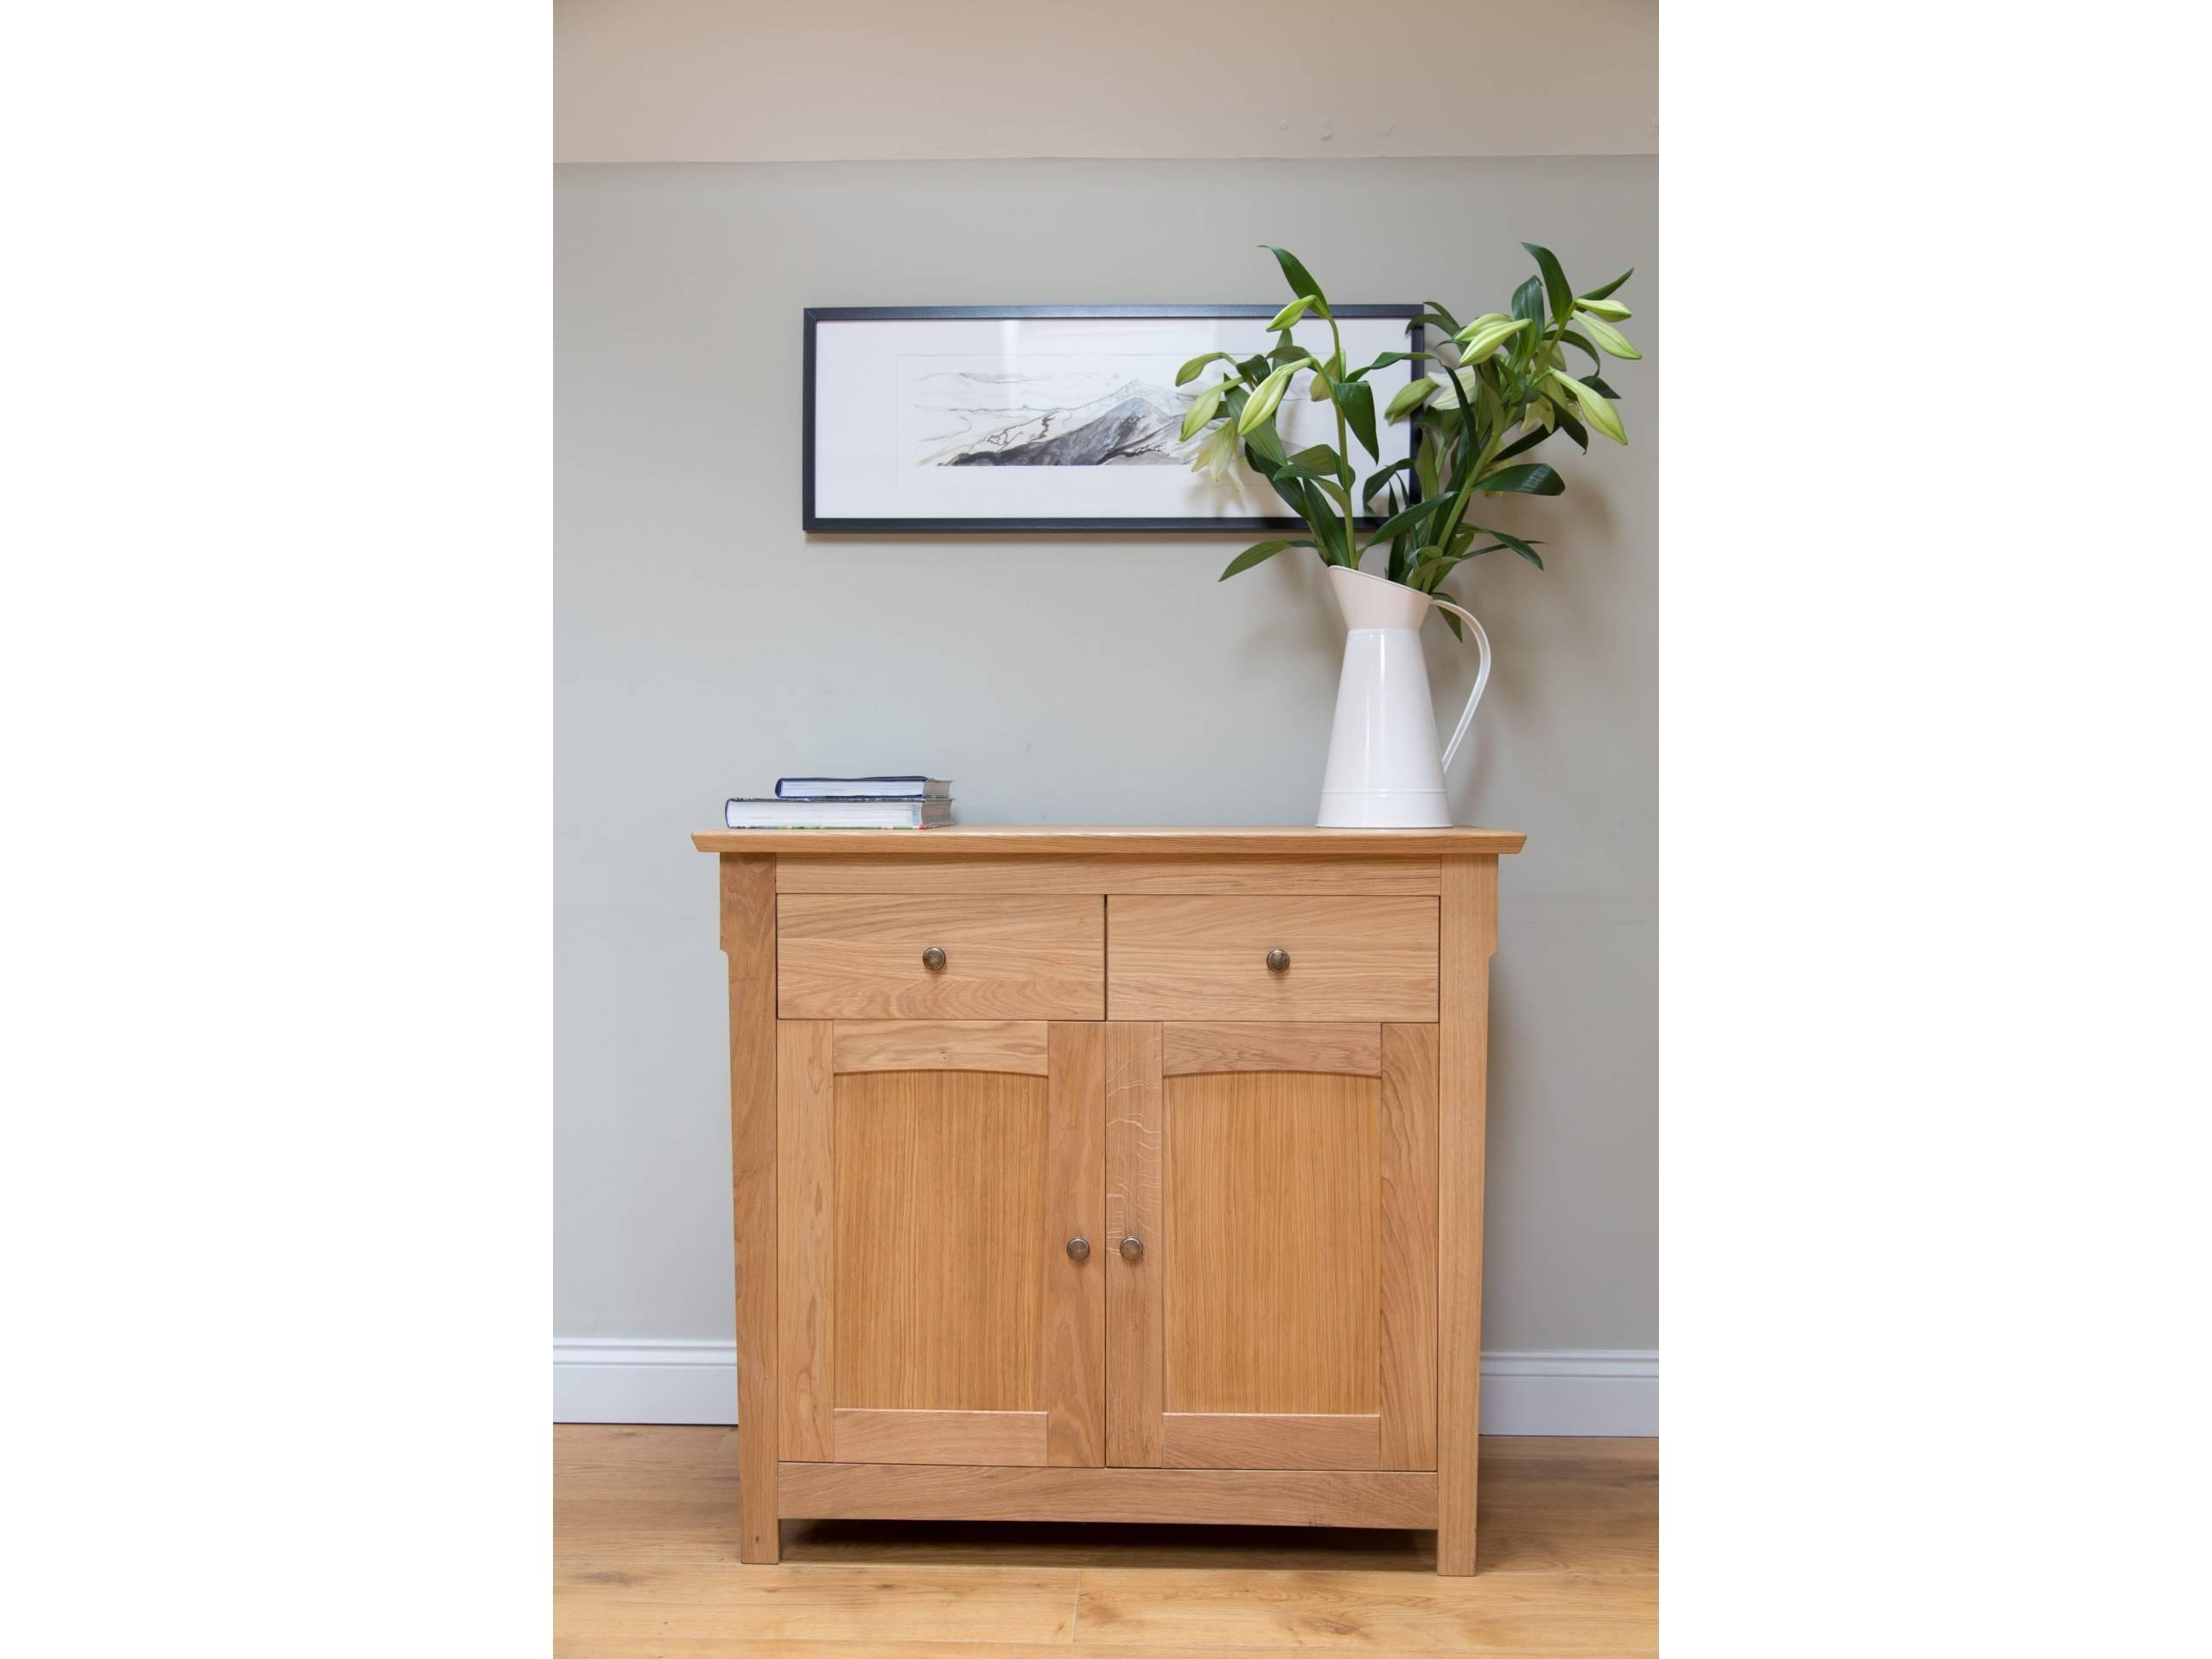 Baltic Small Oak Sideboard – 100Cm Wide | Small Wooden Sideboard Pertaining To Small Wooden Sideboard (#1 of 20)